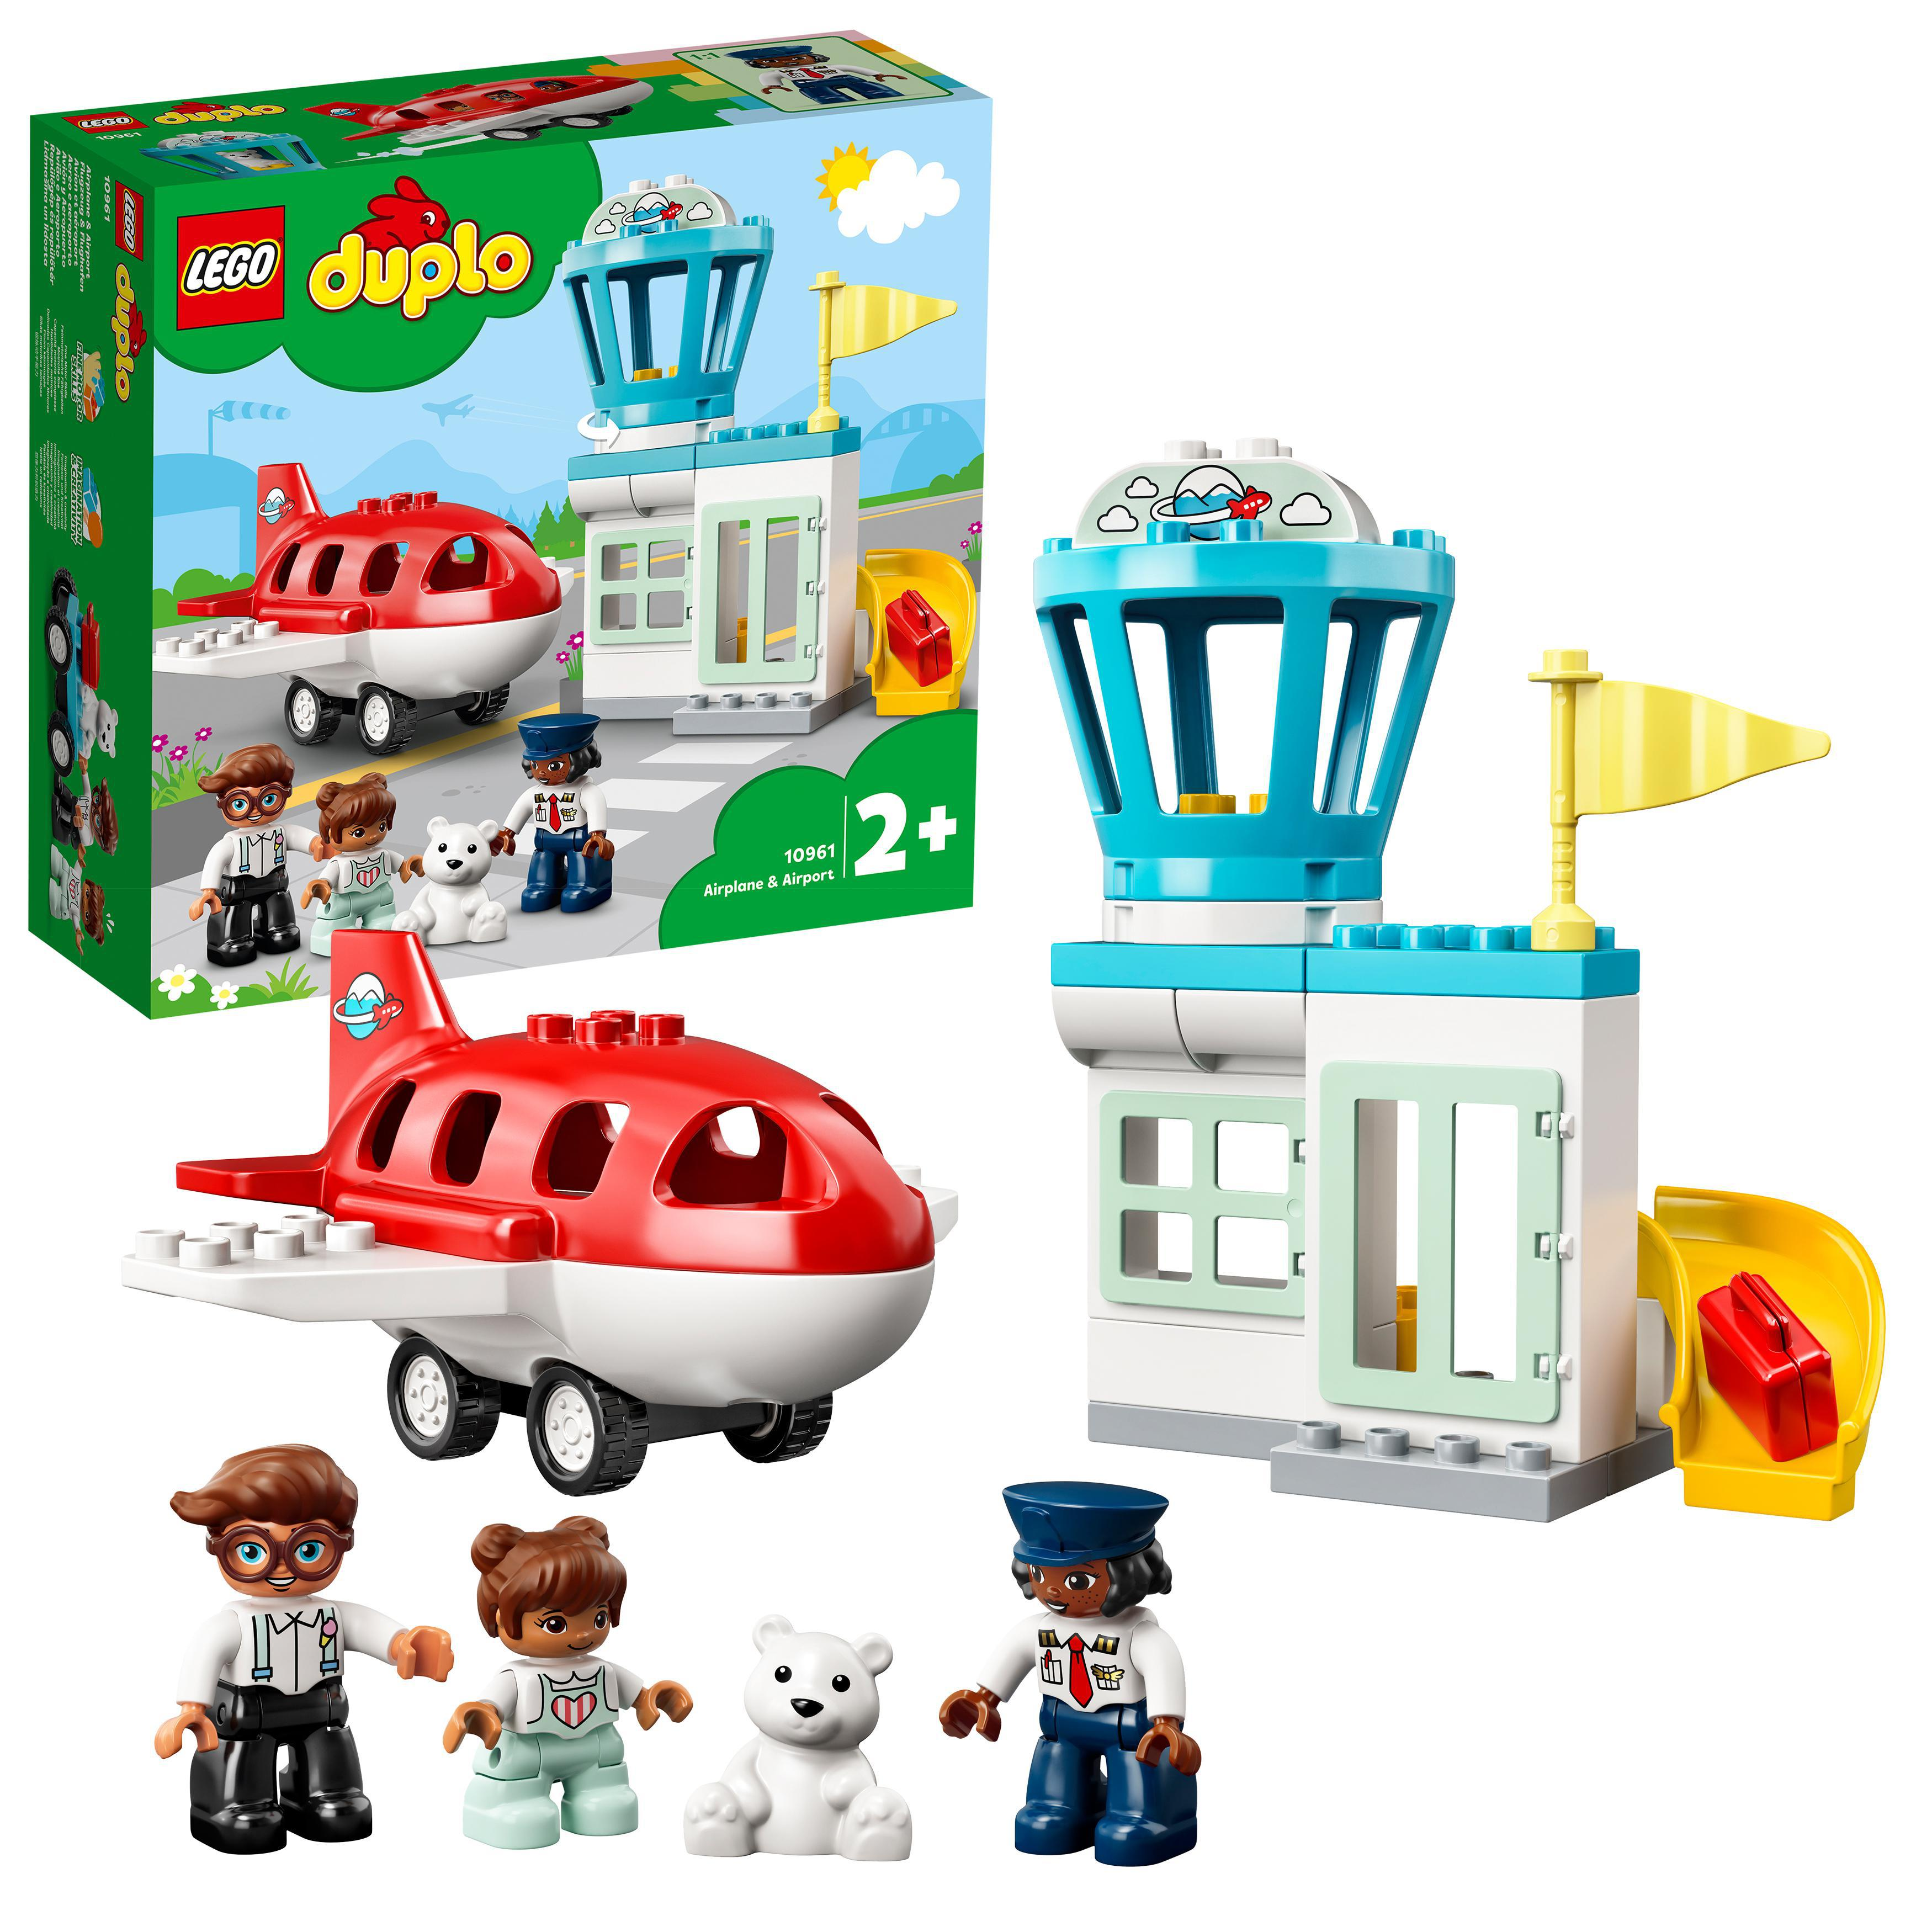 LEGO DUPLO - Airplane & Airport (10961)